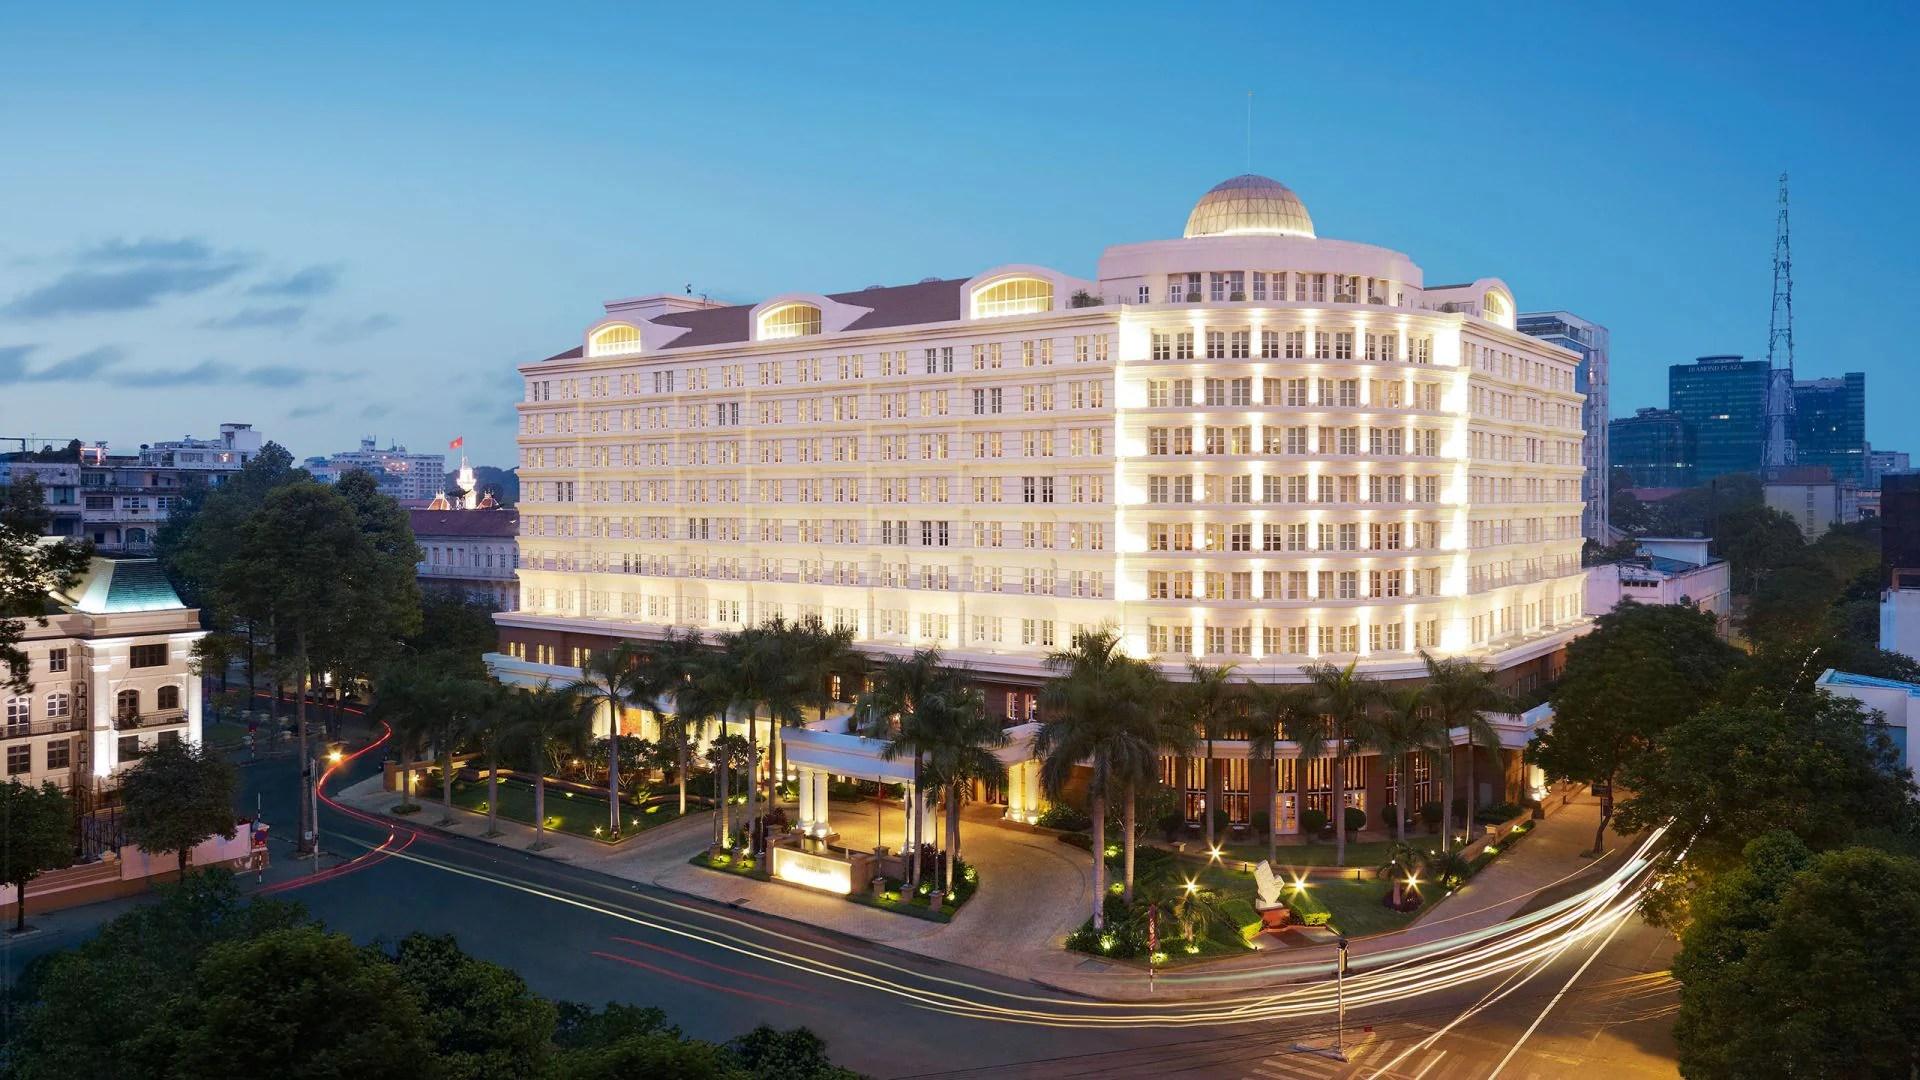 Luxury Ho Chi Minh City Hotels, Vietnam  Park Hyatt Saigon